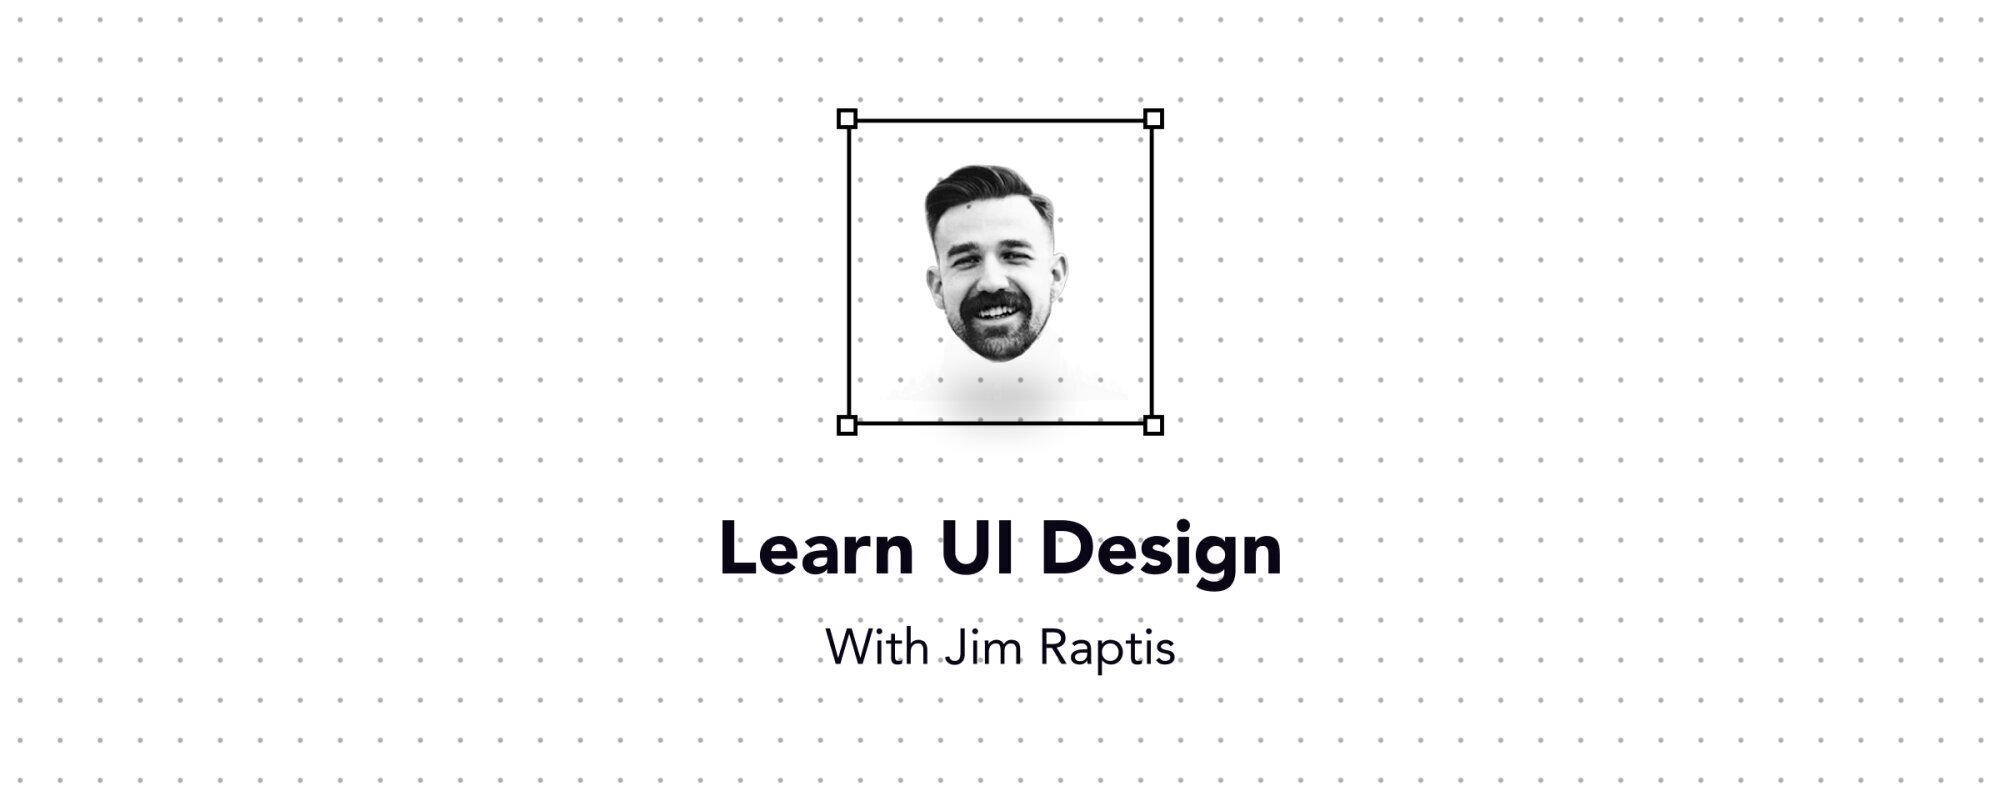 Learn UI design with Jim Raptis